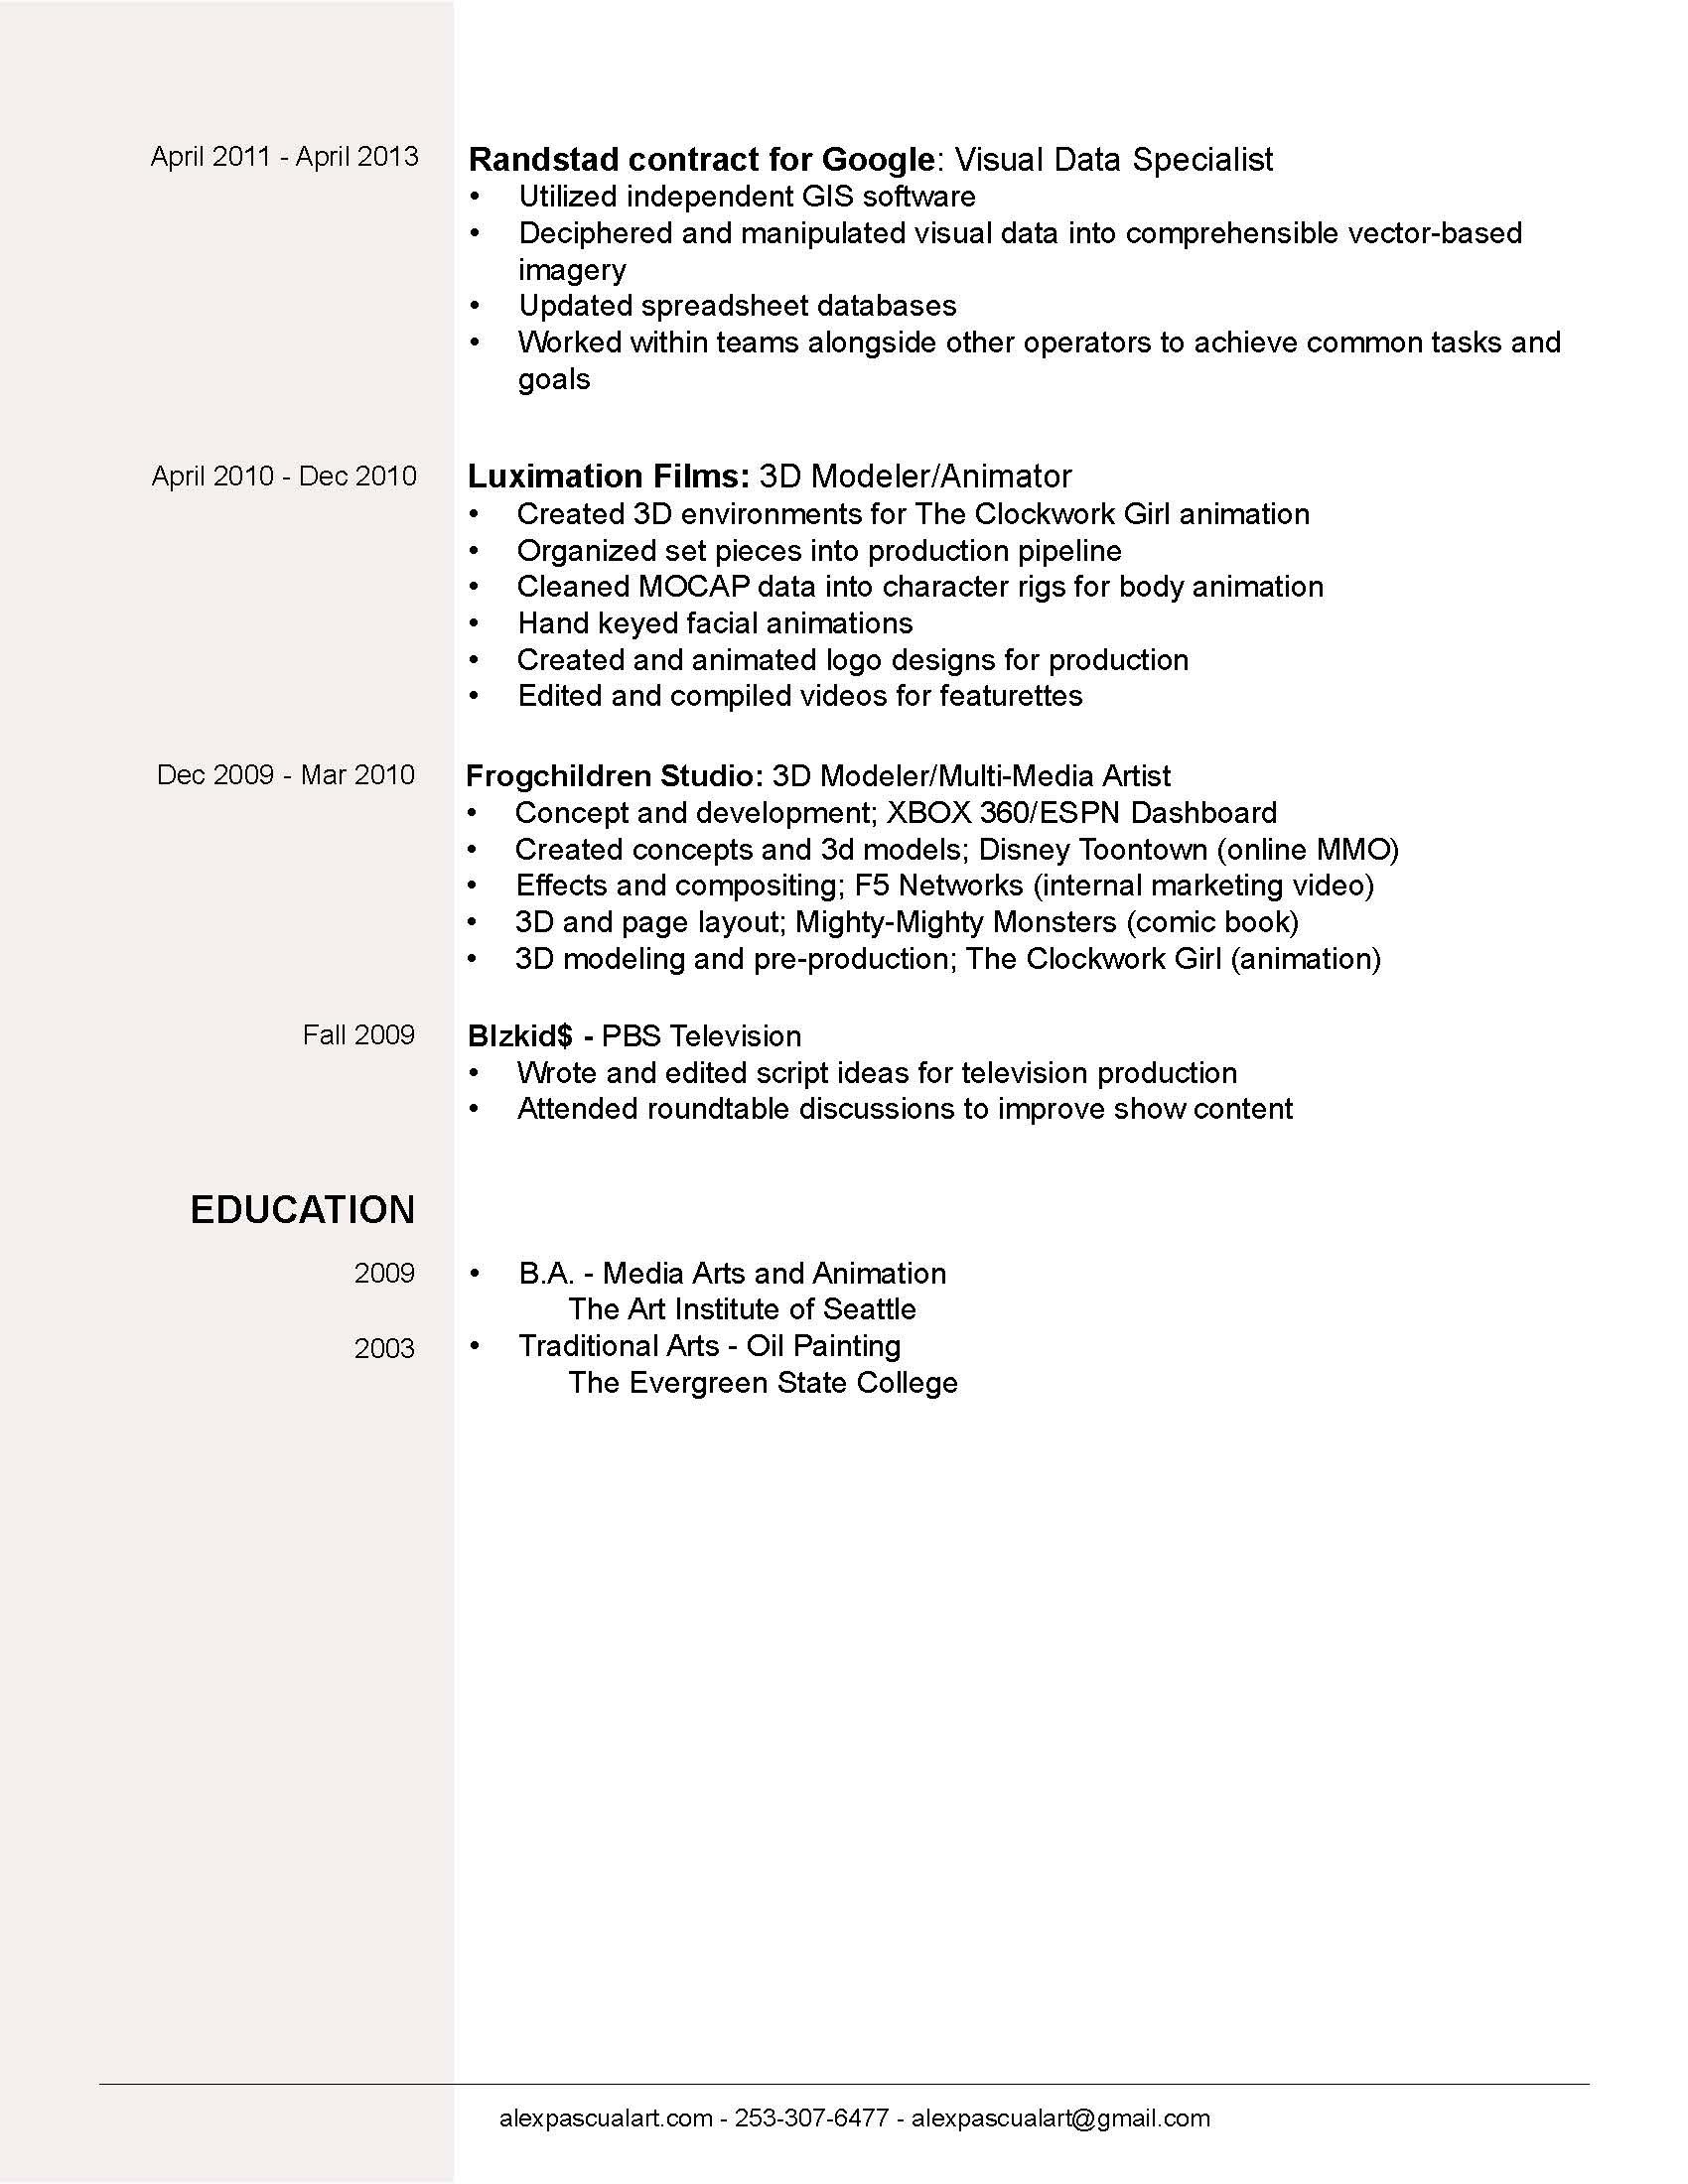 Alex_Pascual_Resume_2018_Page_2.jpg